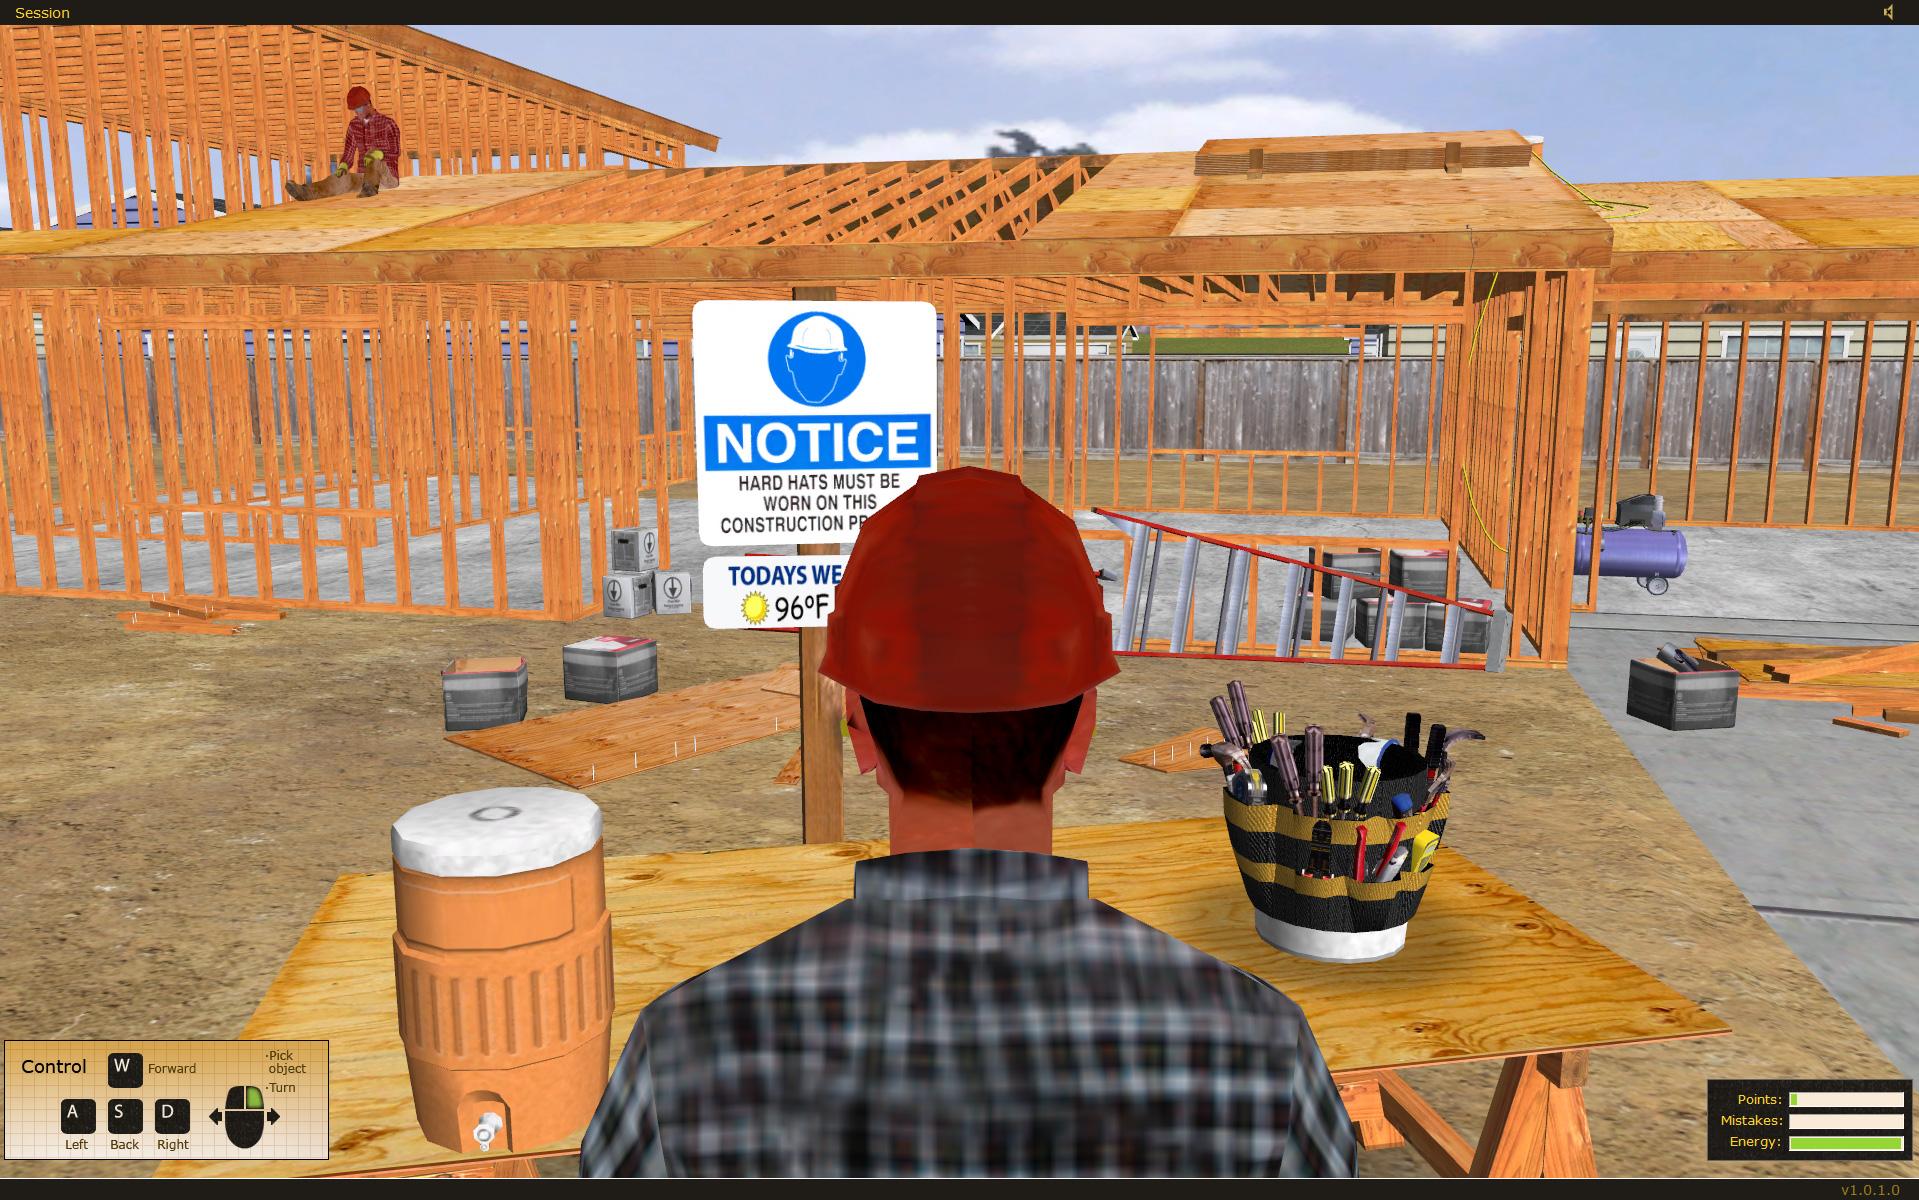 California State Compensation Insurance Fund HazOps Safety Training Simulator